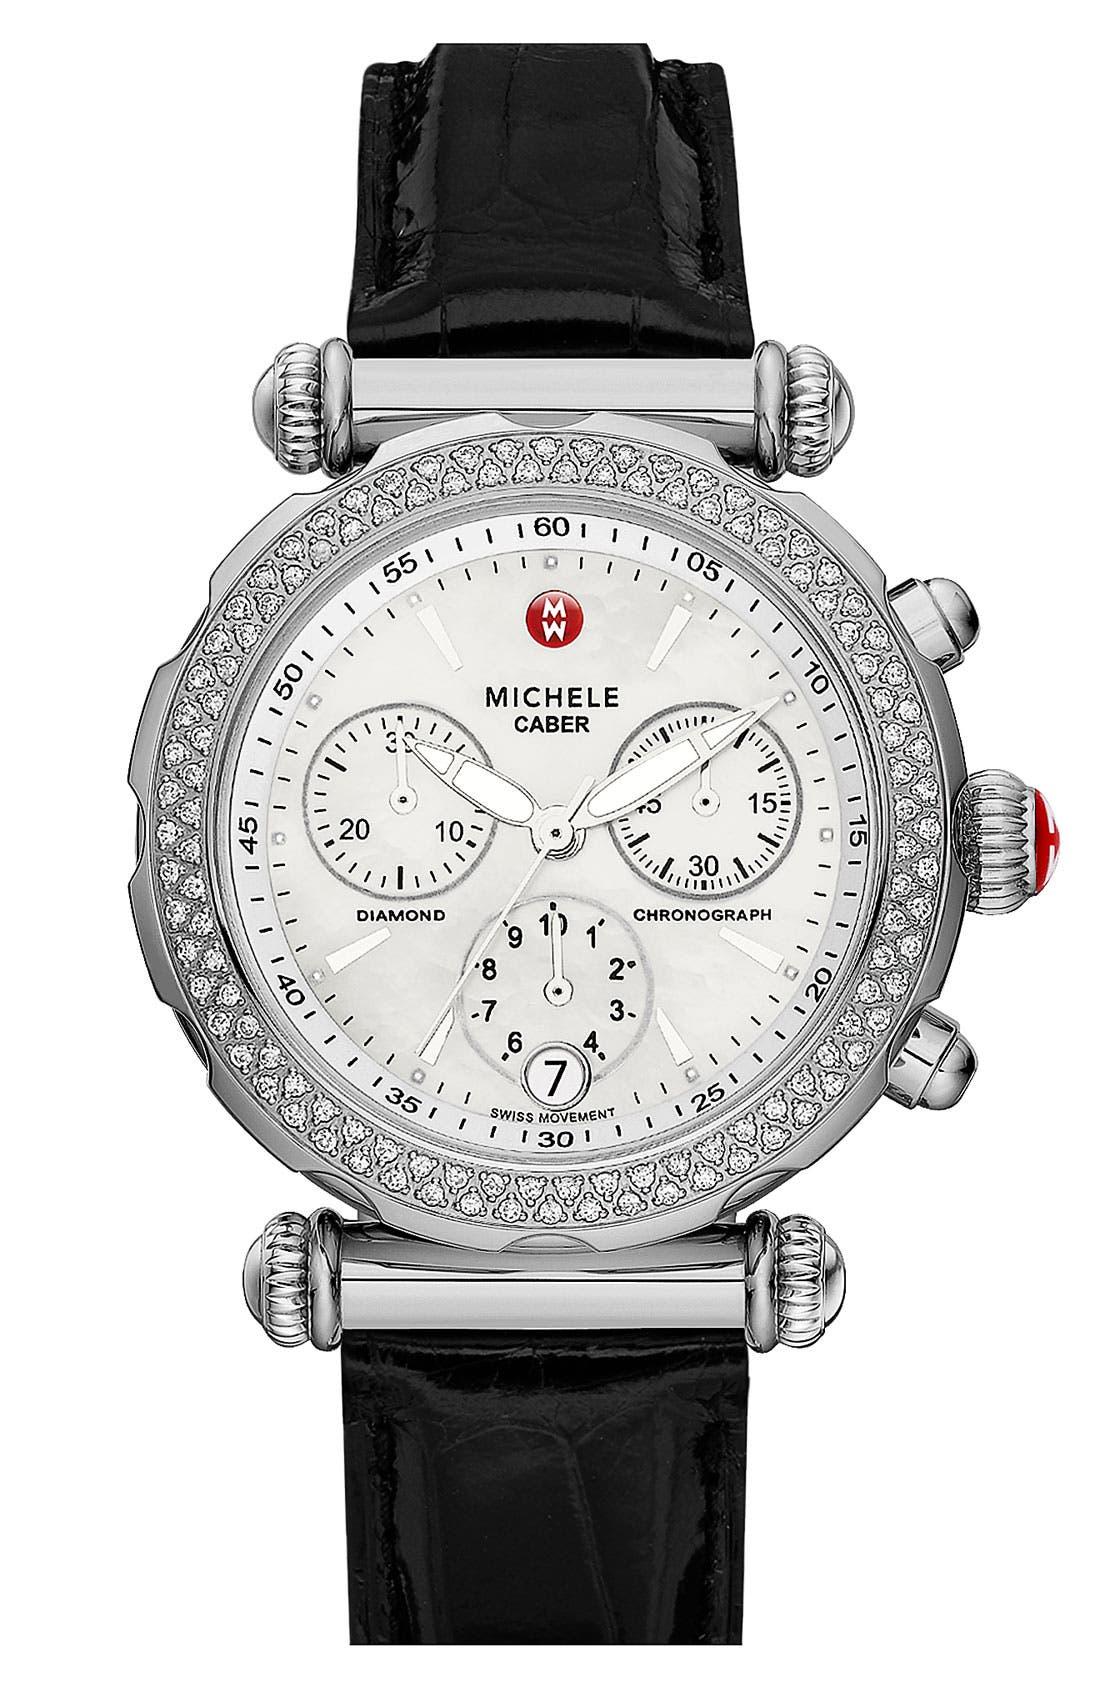 Main Image - MICHELE 'Caber Sport' Customizable Watch